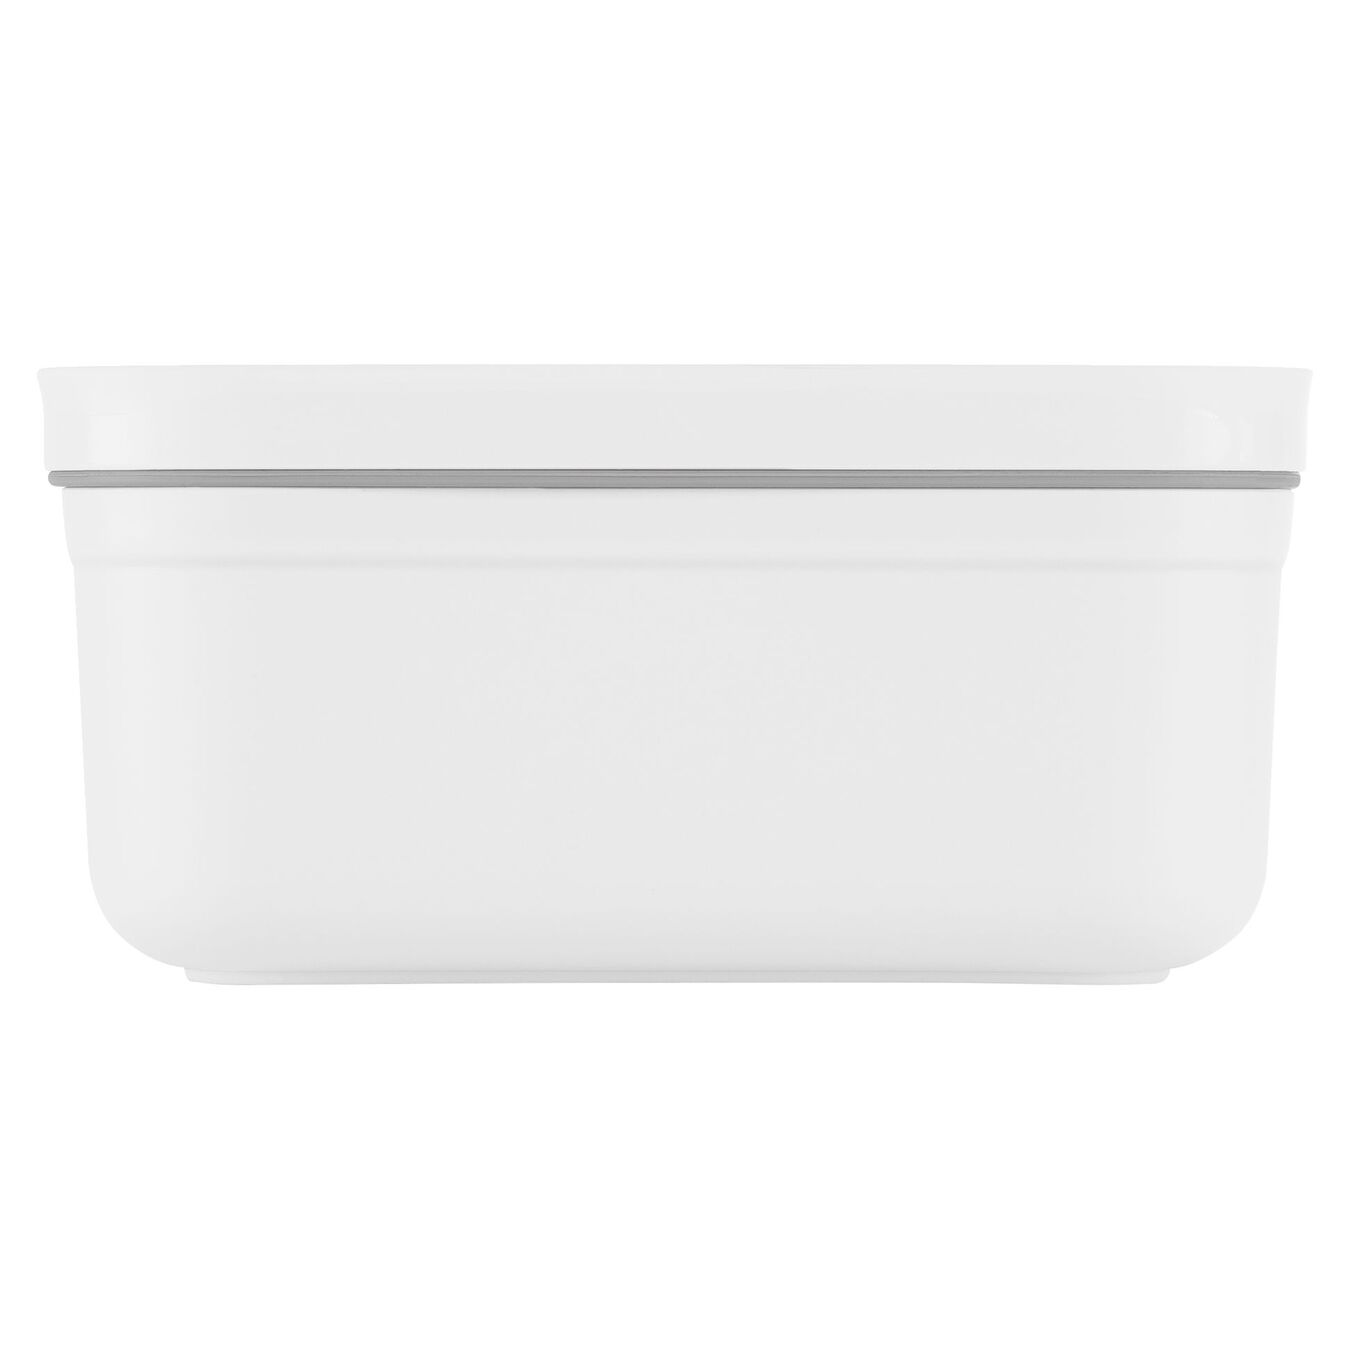 Vakuum Lunchbox, S, Kunststoff, Weiß,,large 2